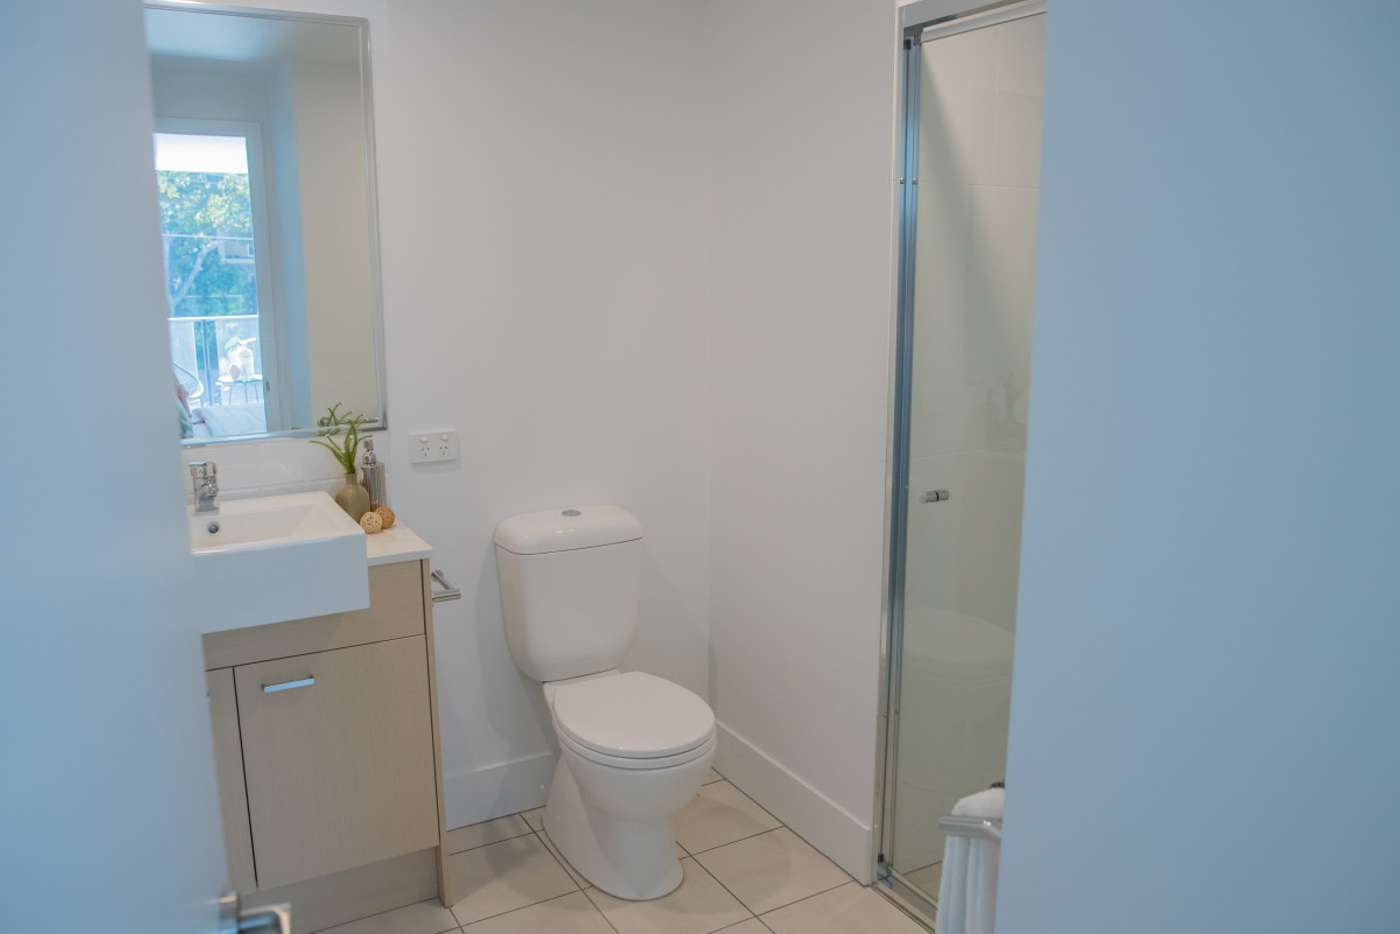 Seventh view of Homely apartment listing, 208/27-33 Nundah Street, Nundah QLD 4012